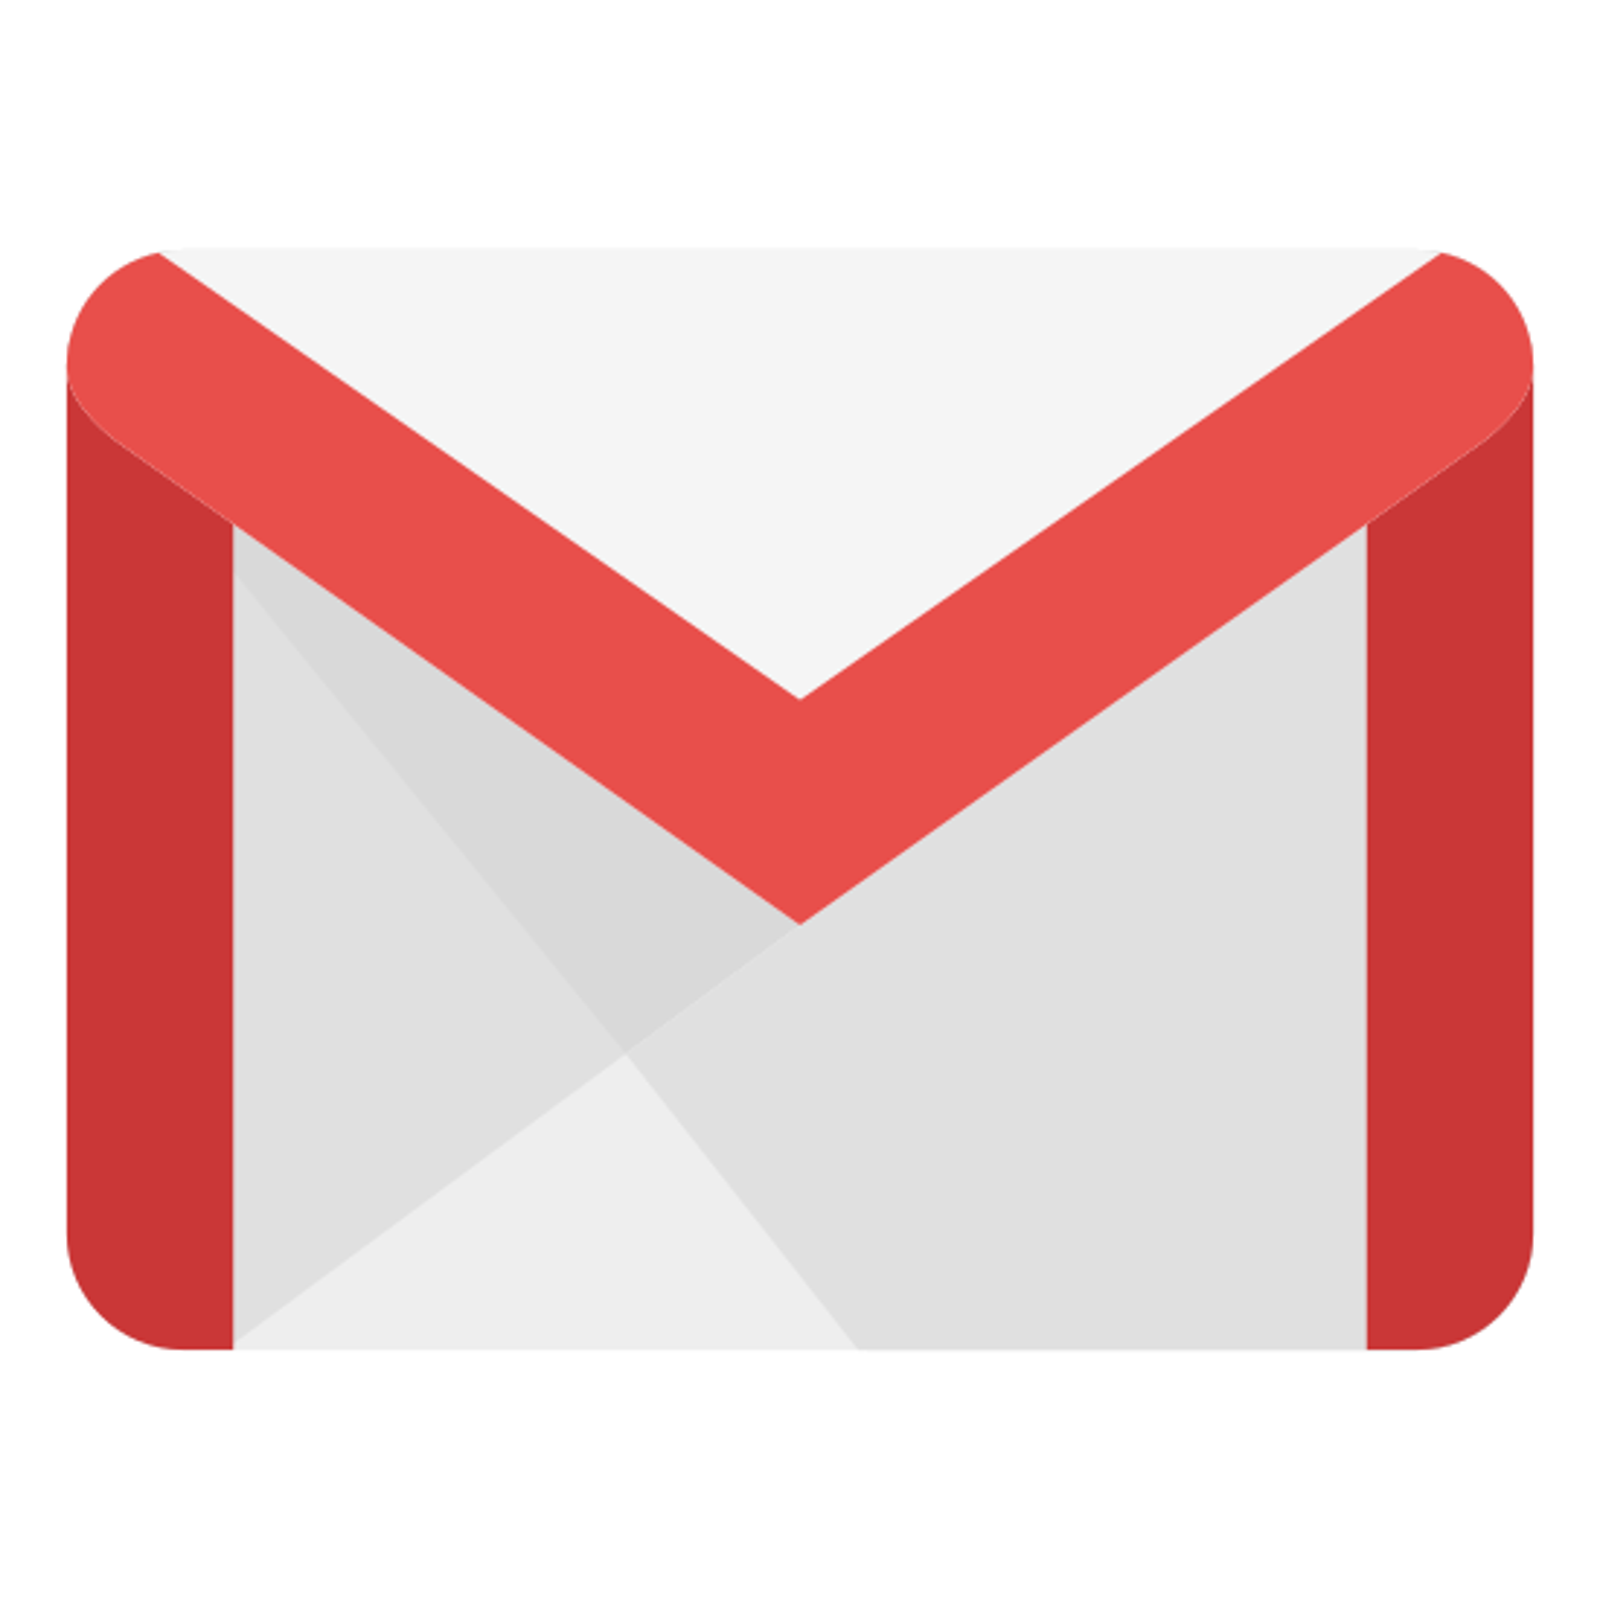 Resultado de imagen para logo gmail